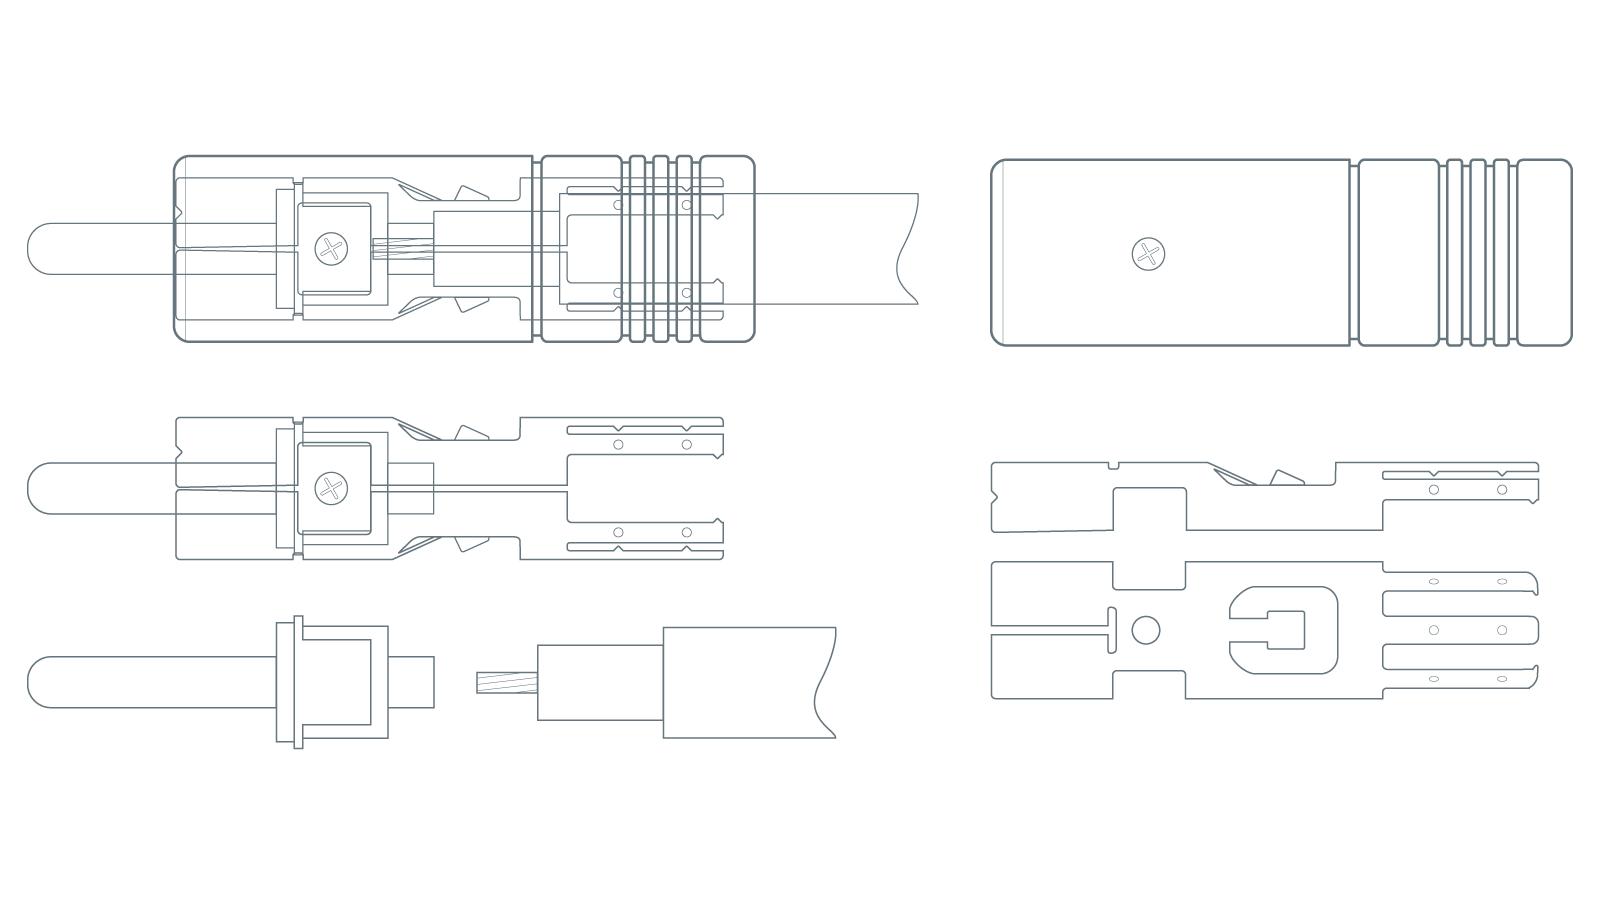 Atlas Hyper Integra Turntable Audio Cable Future Shop Jack Plate Wiring Diagram Plug Technical